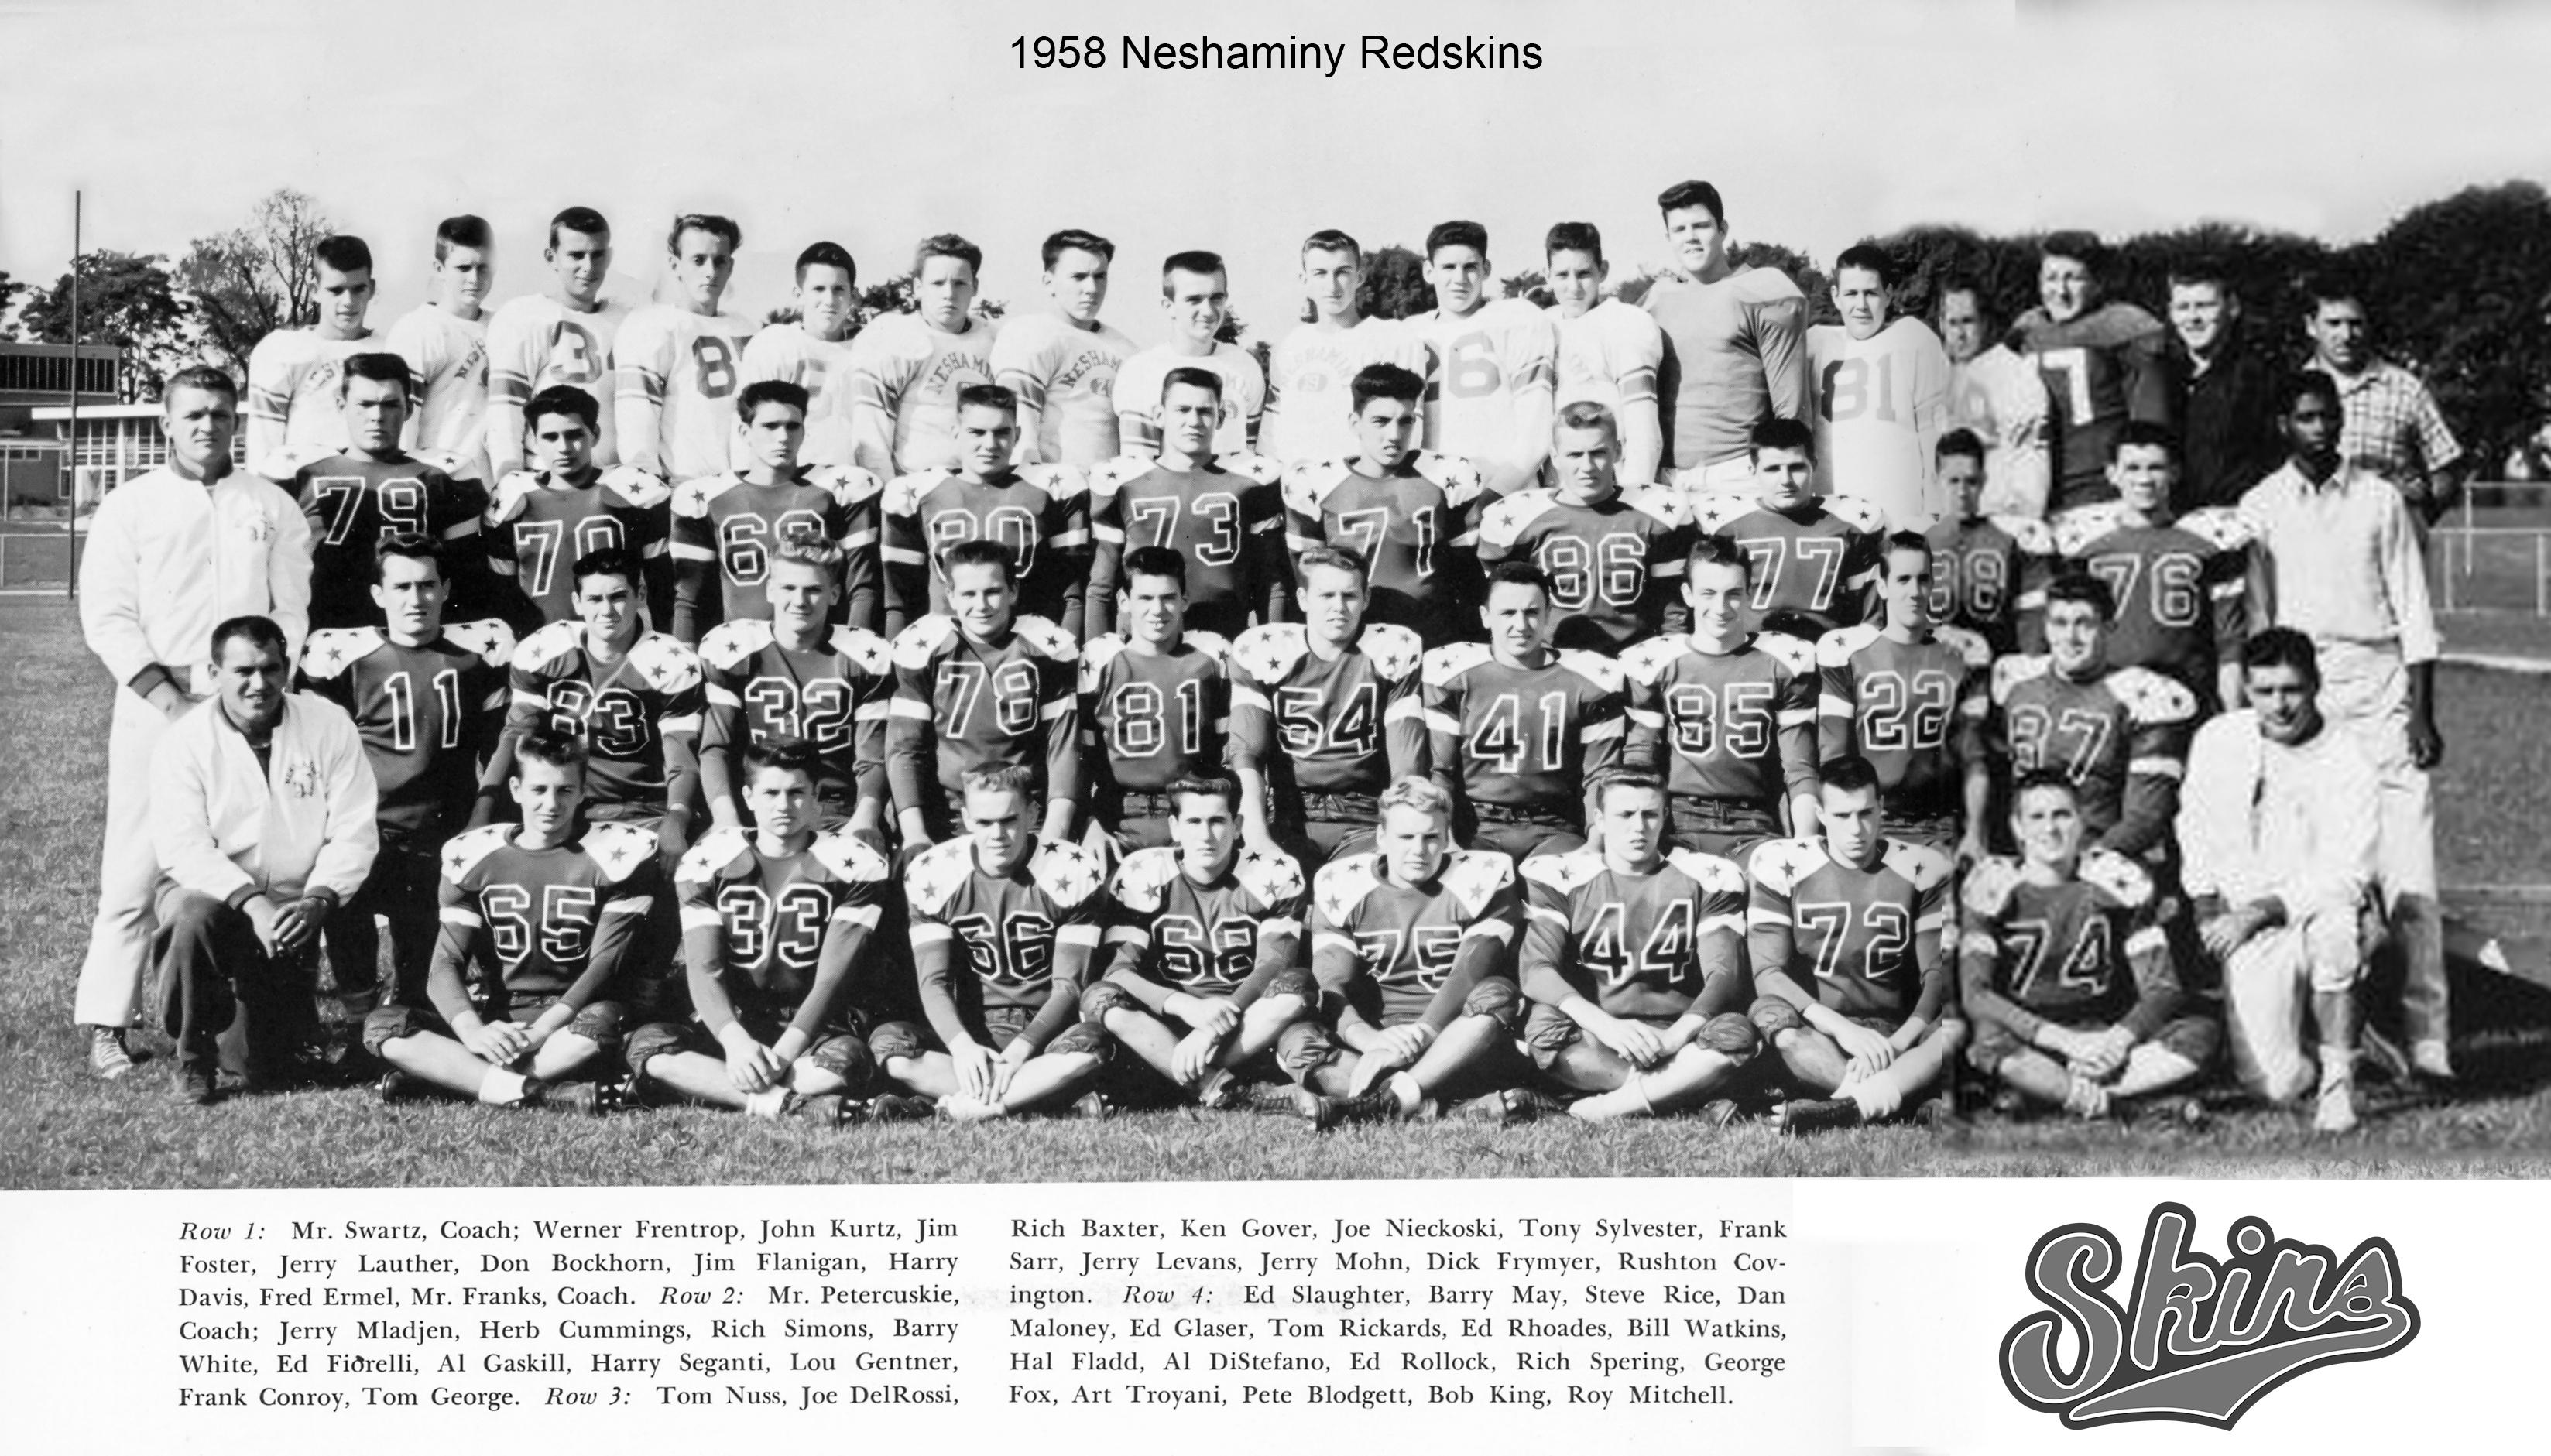 1957 team